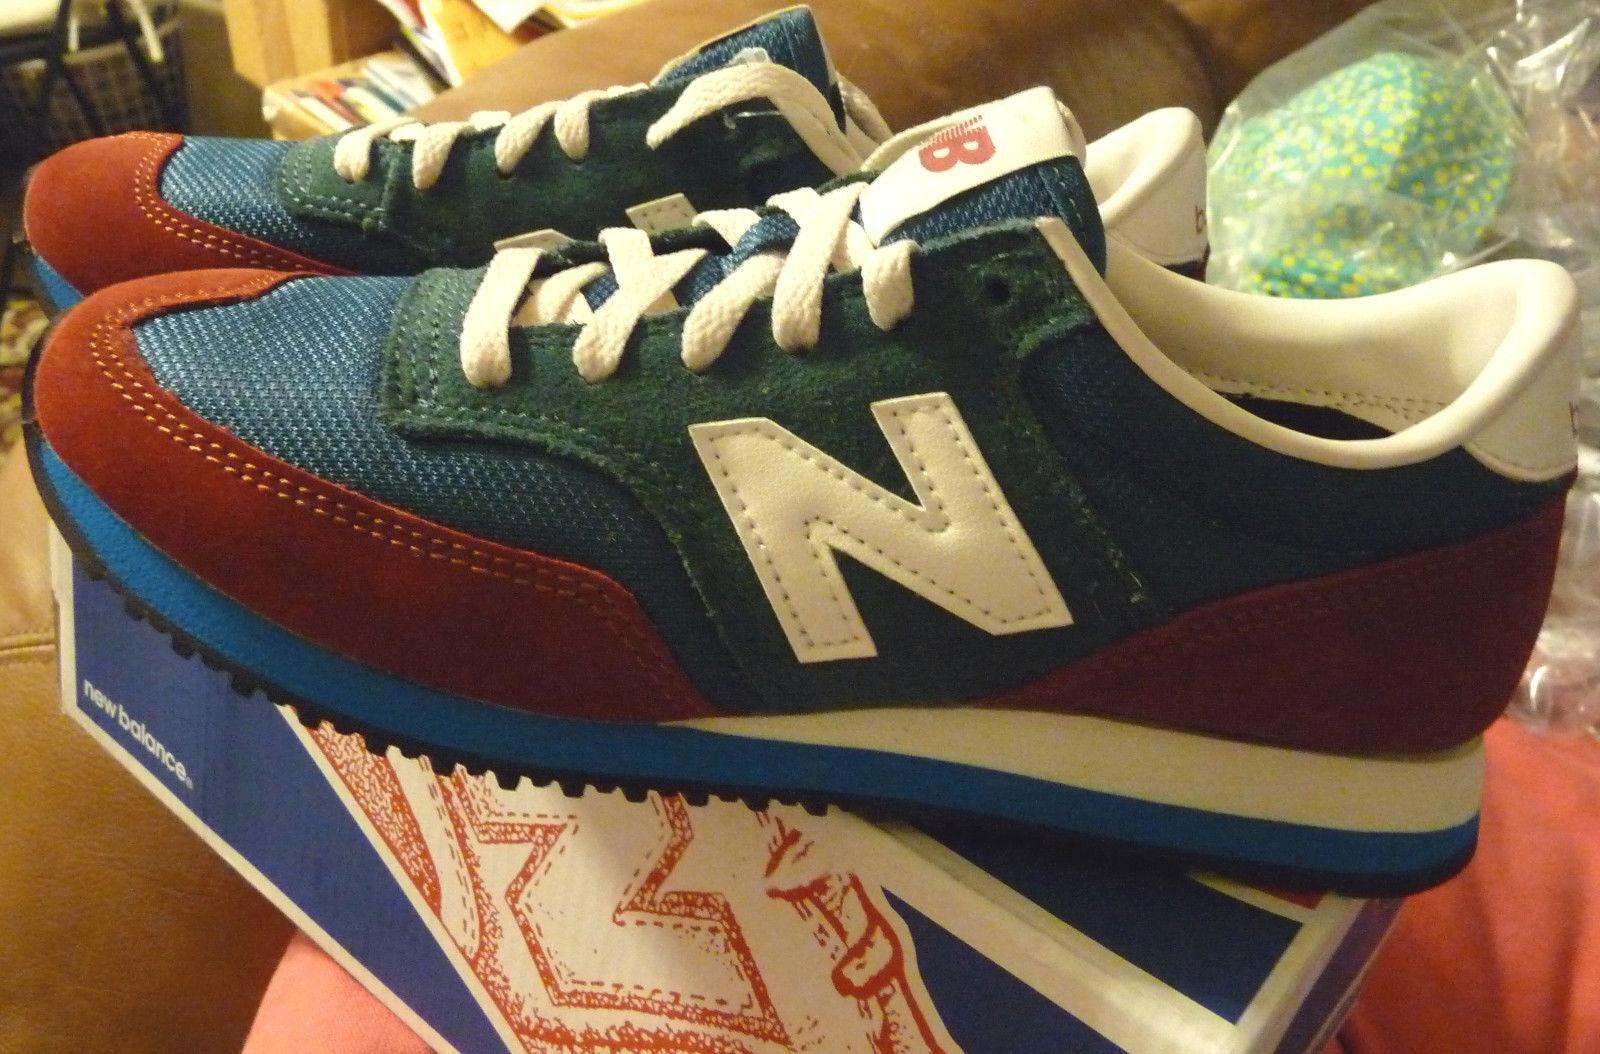 NIB New Balance 620 Sneakers for J.Crew 9.5 Damens Schuhes Sneakers BURNT CRIMSON